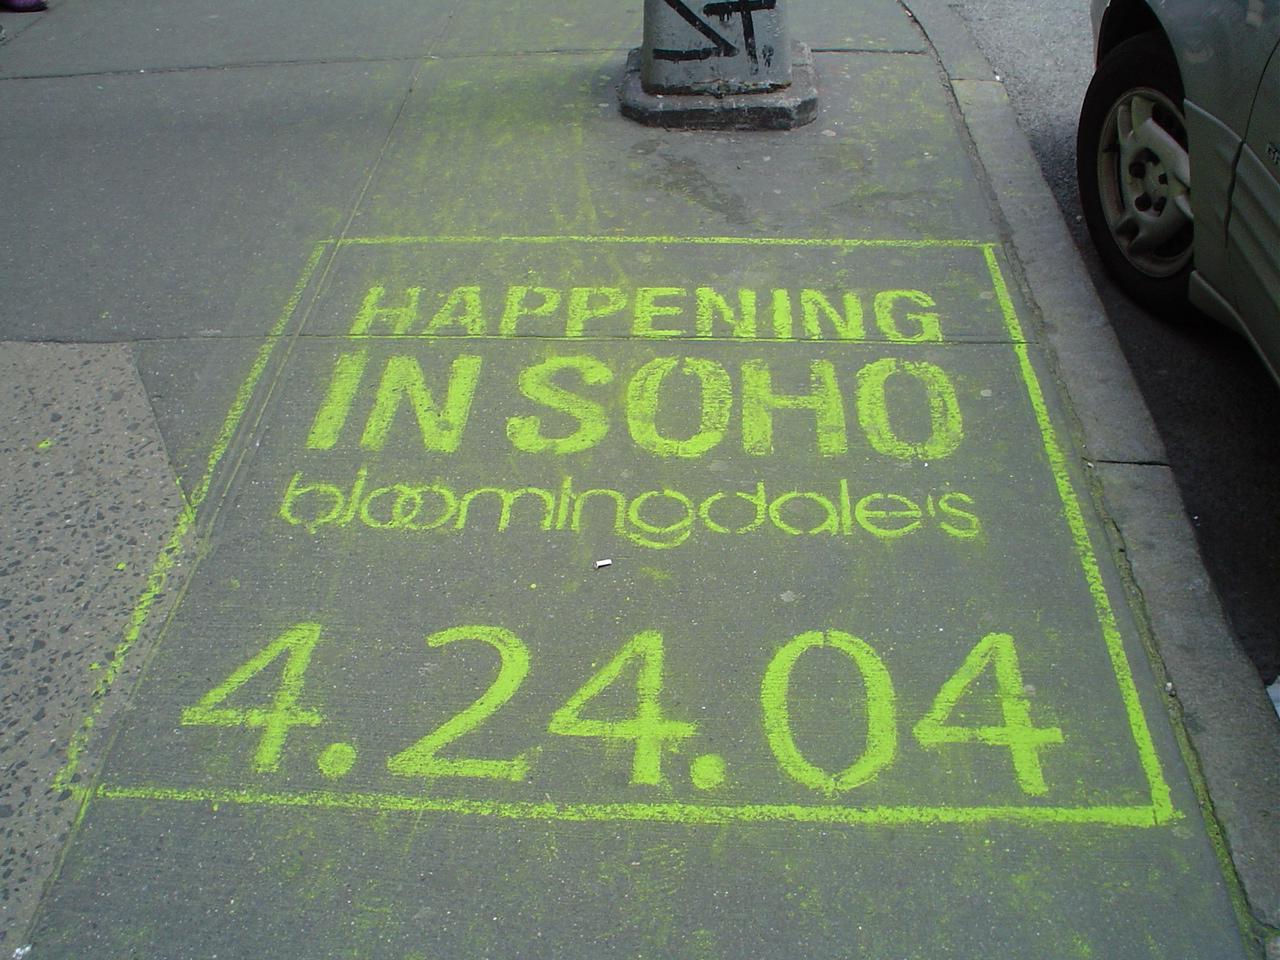 Cool Sidewalk Chalk advertising